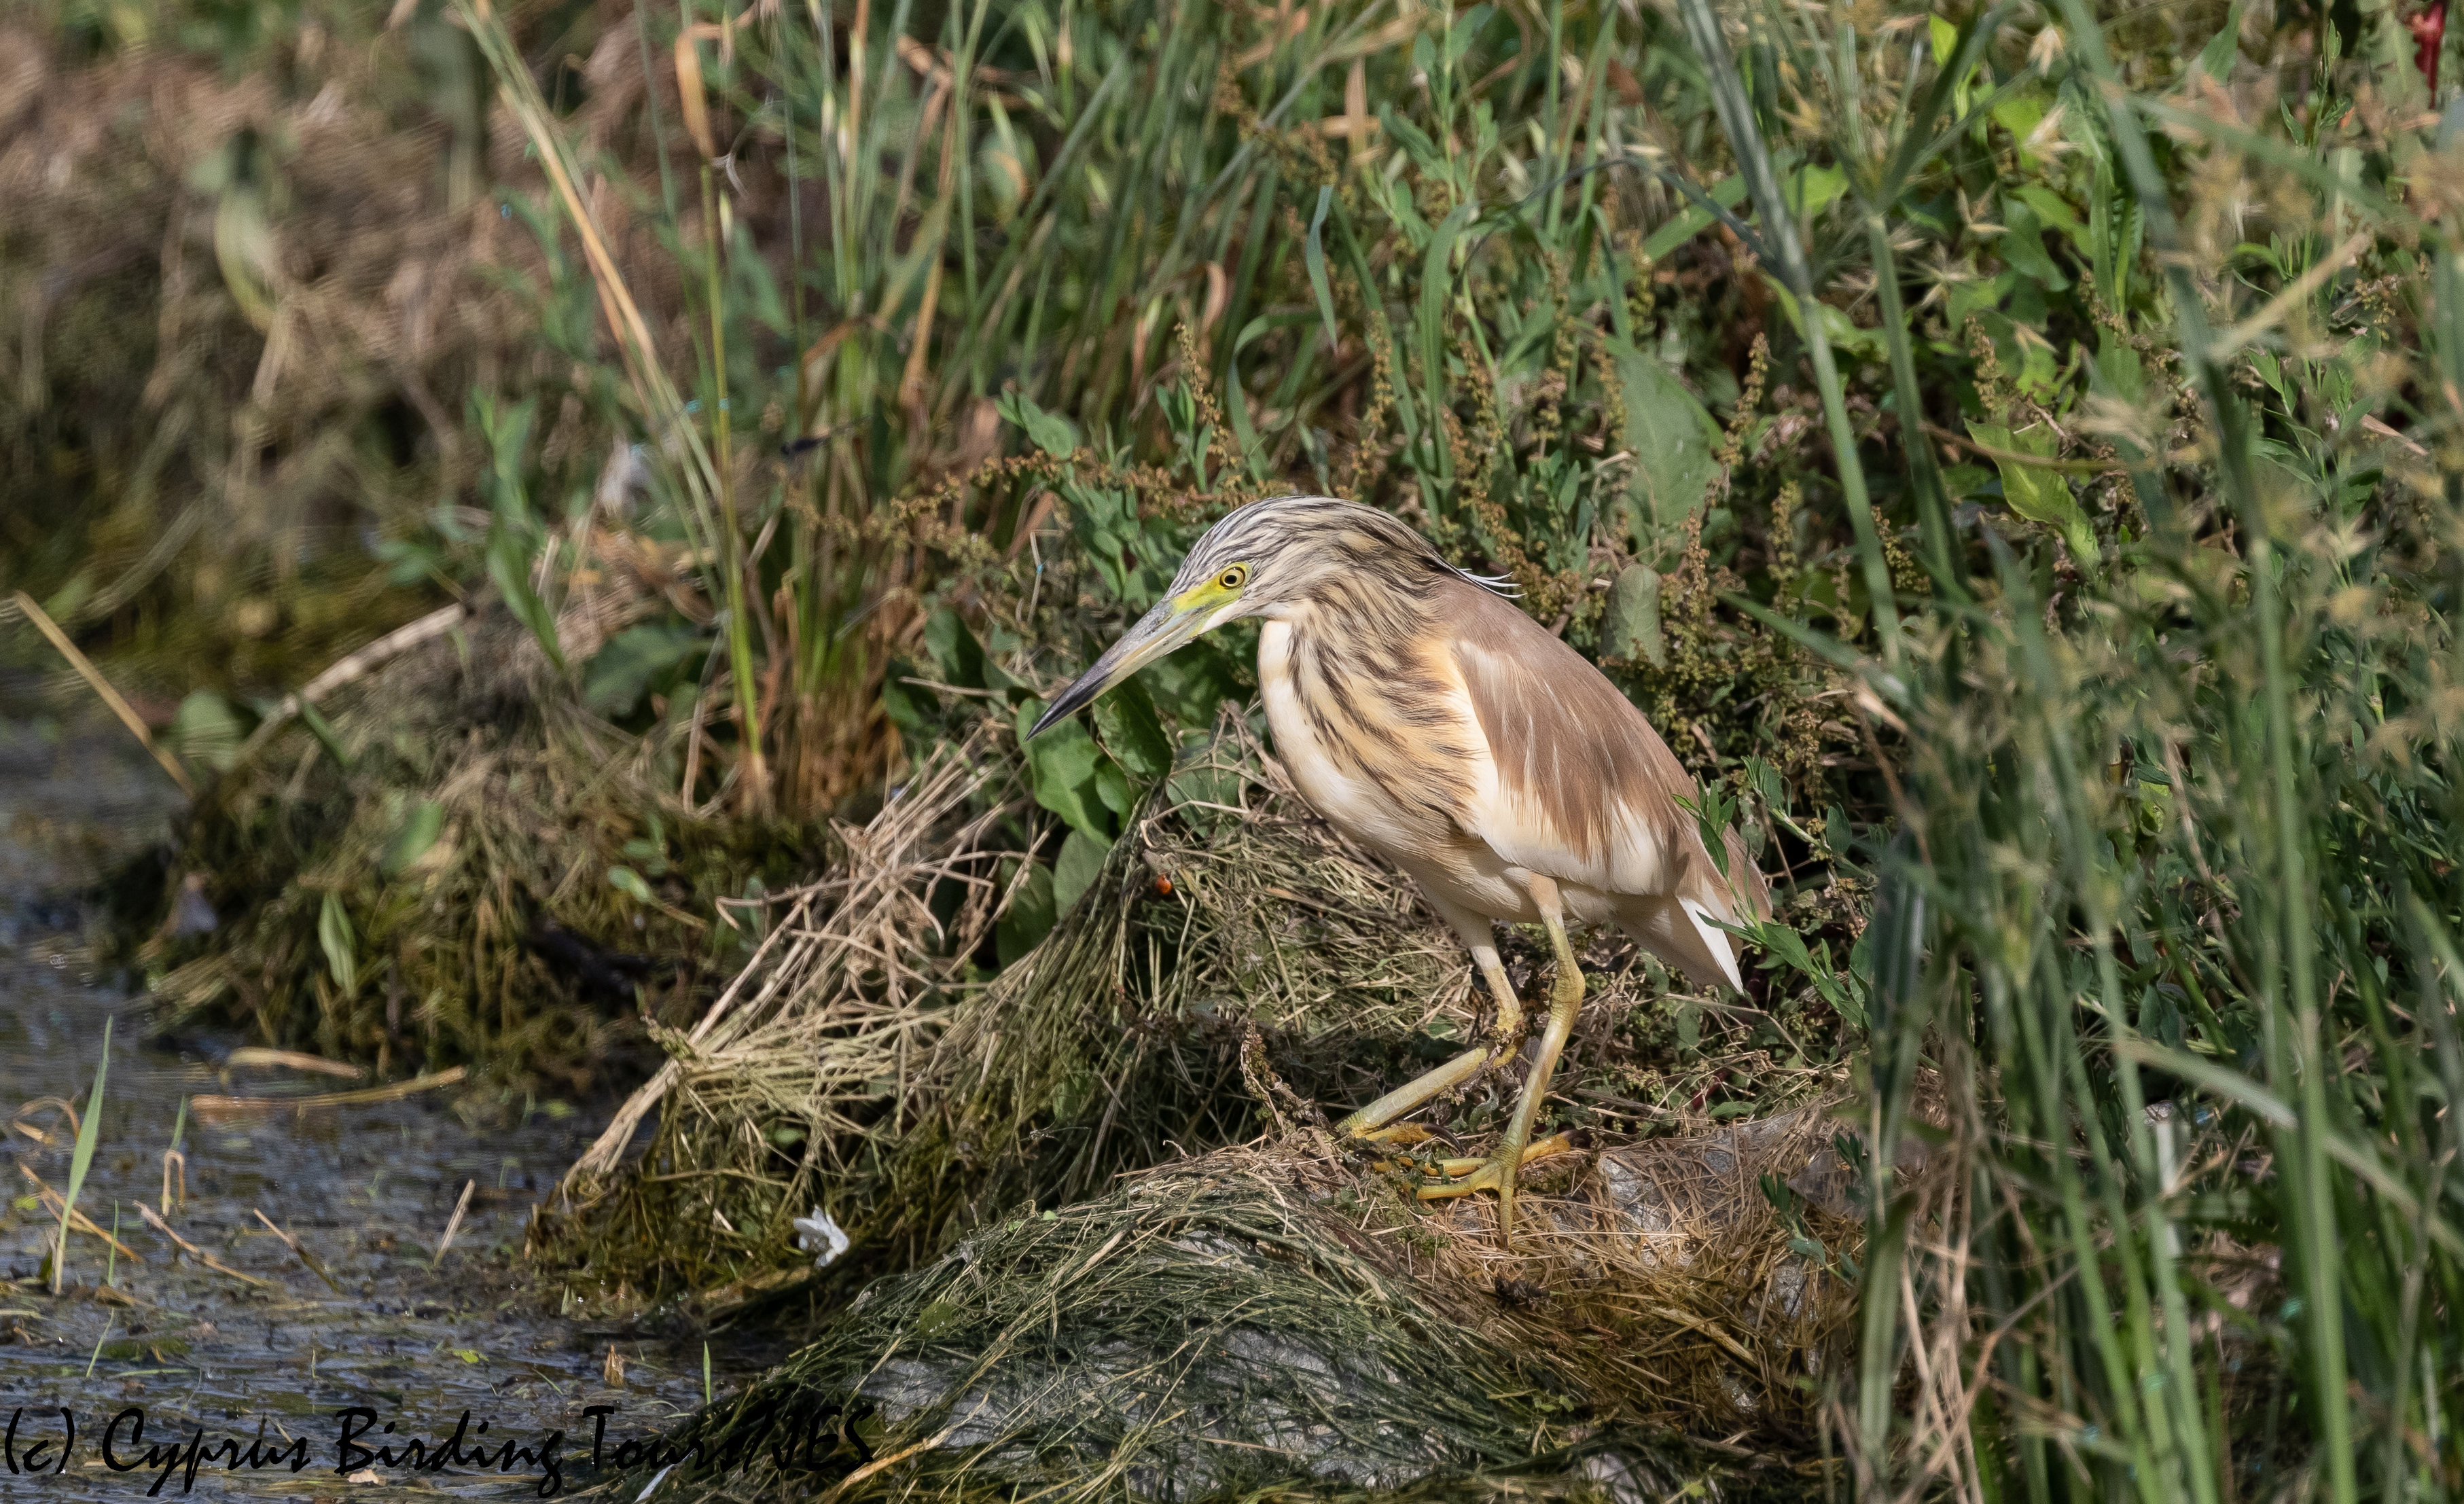 Squacco Heron, Agia Varvara 21st May 2020 (c) Cyprus Birding Tours